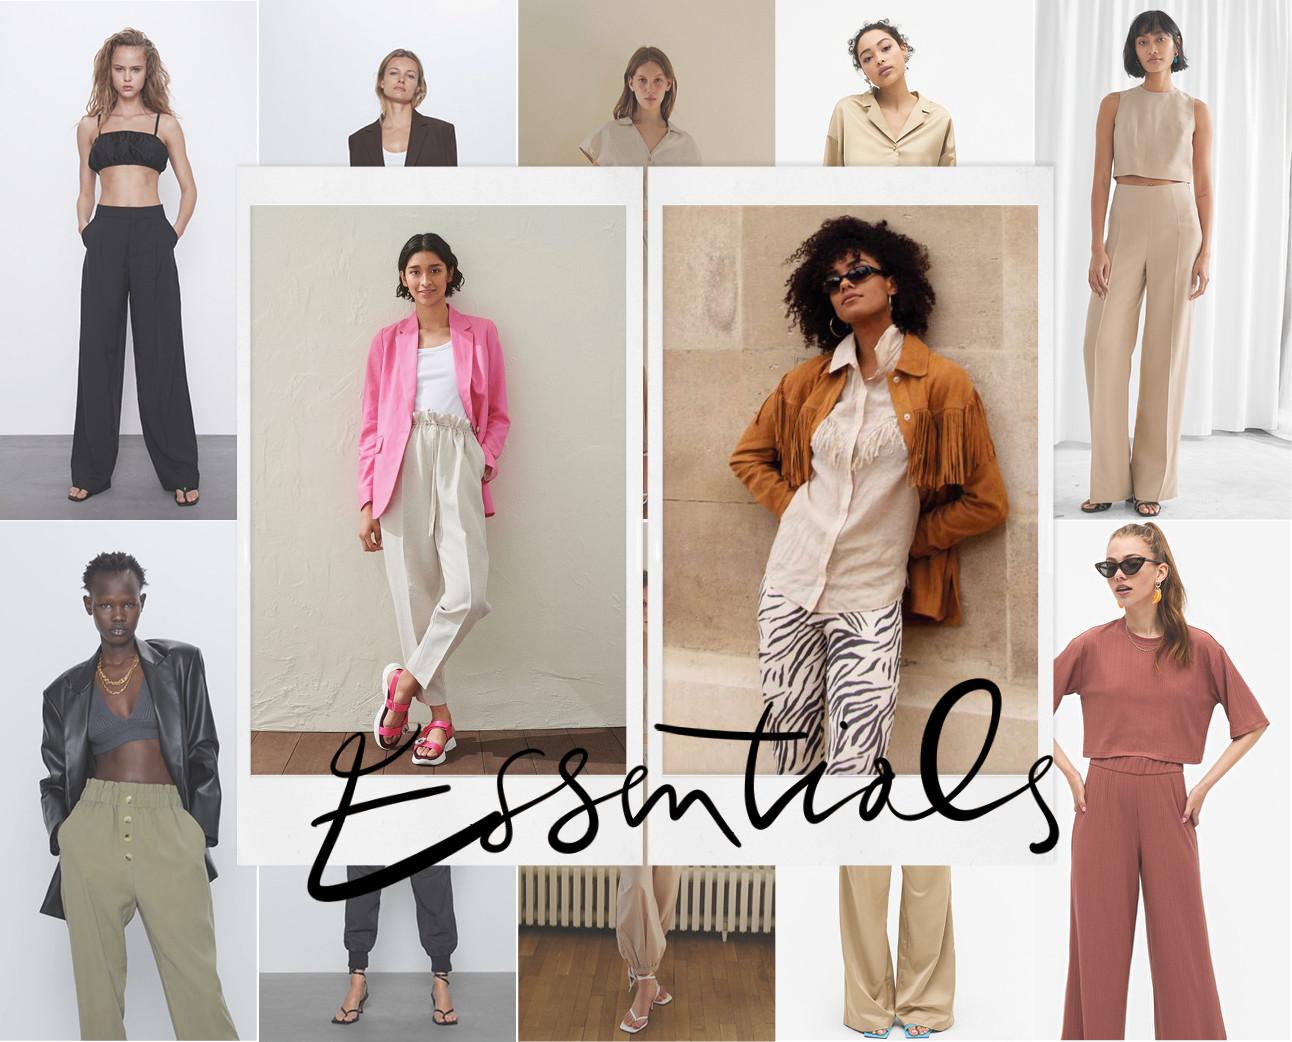 comfy broeken shopping modellen